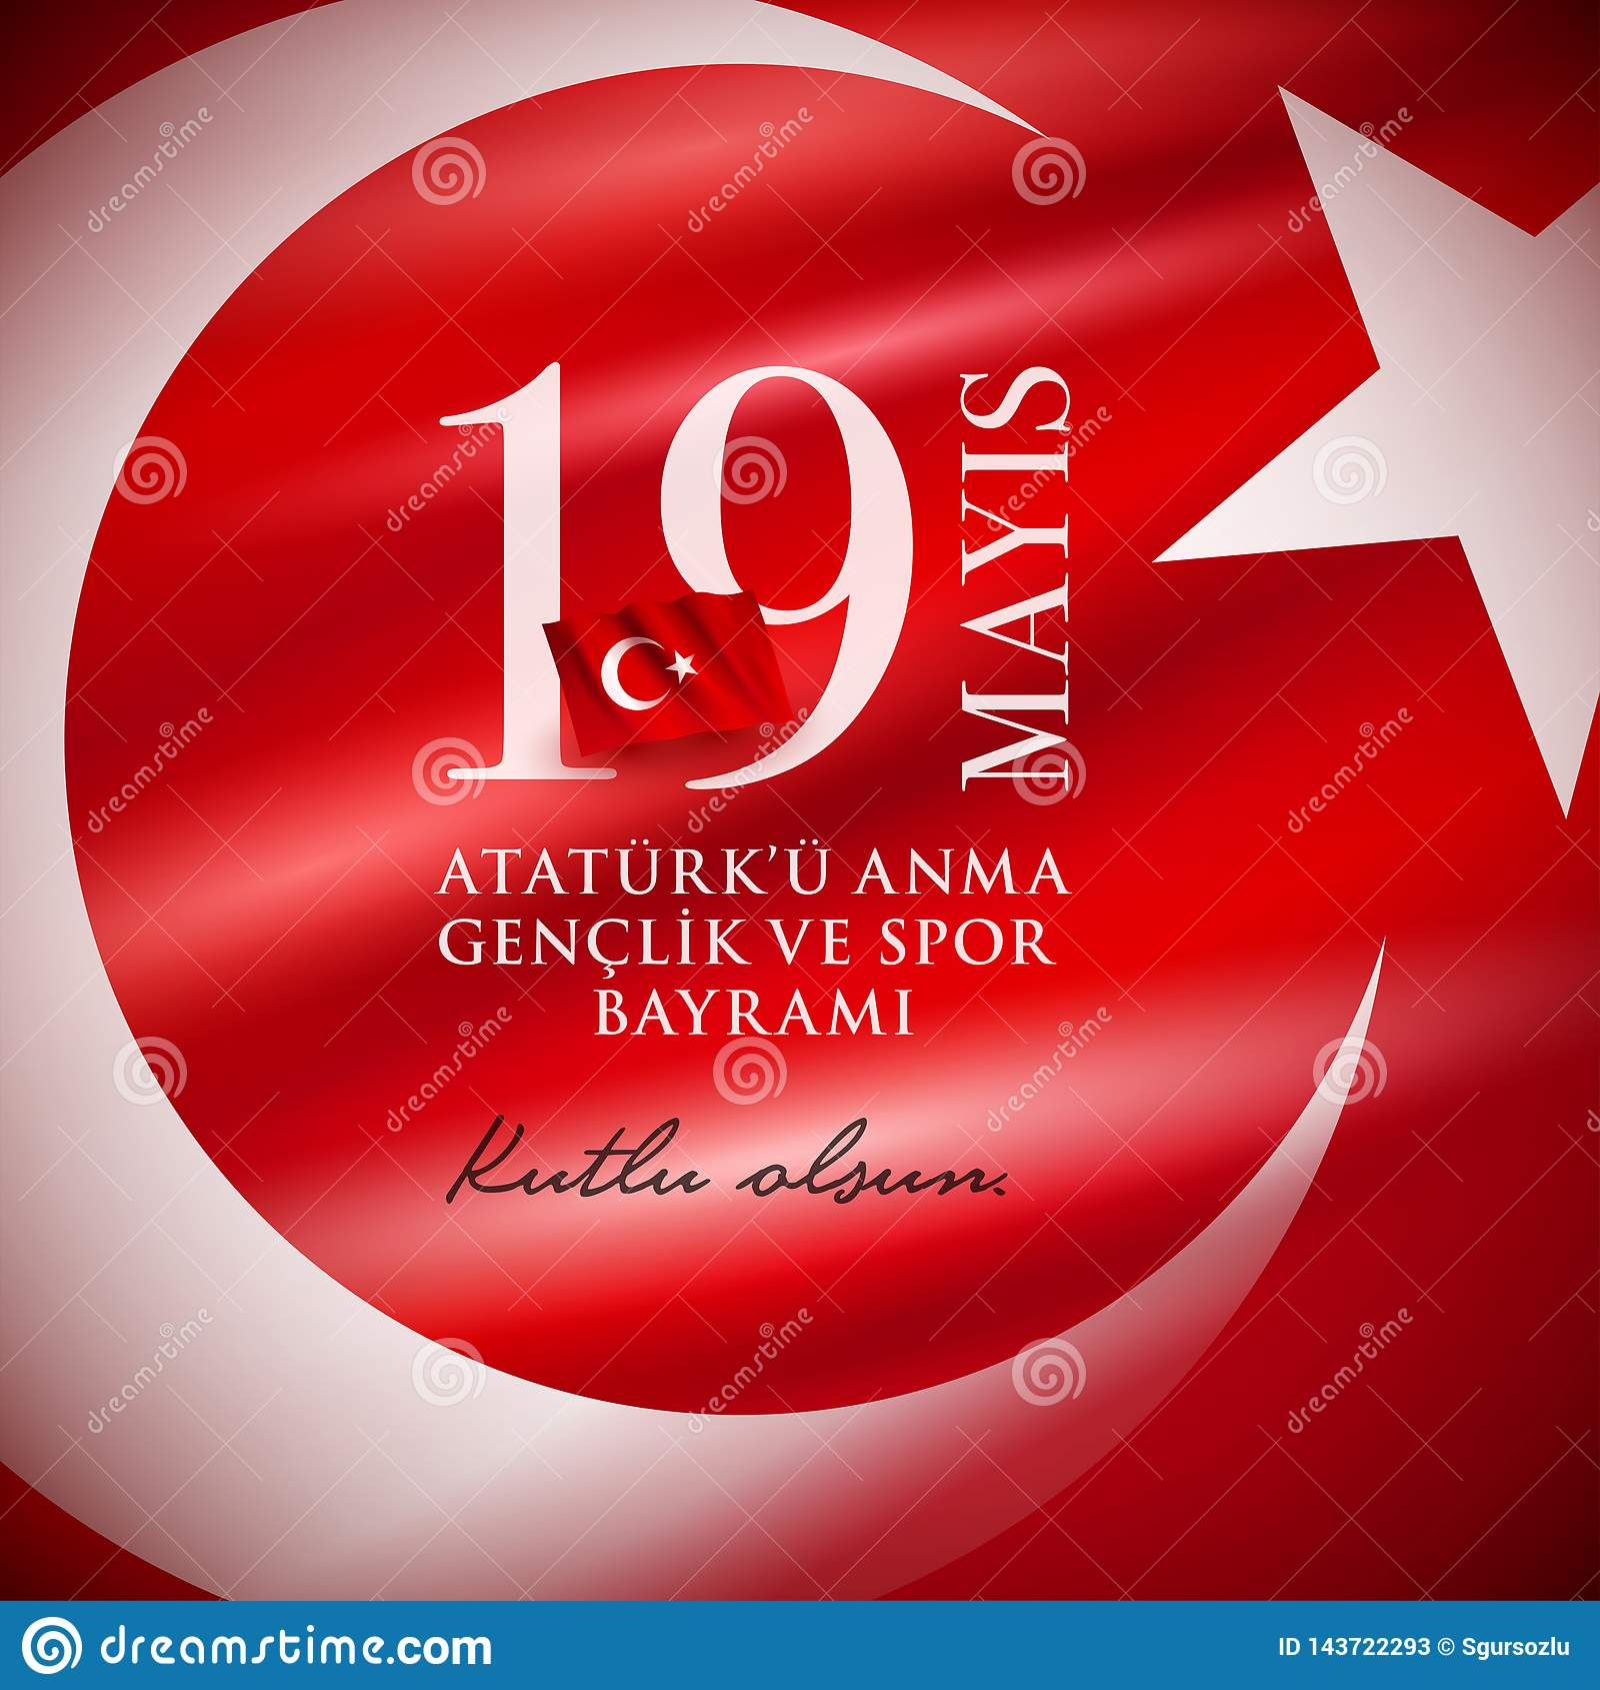 19 mayis Ataturk`u Anma Genclik ve Spor Bayrami